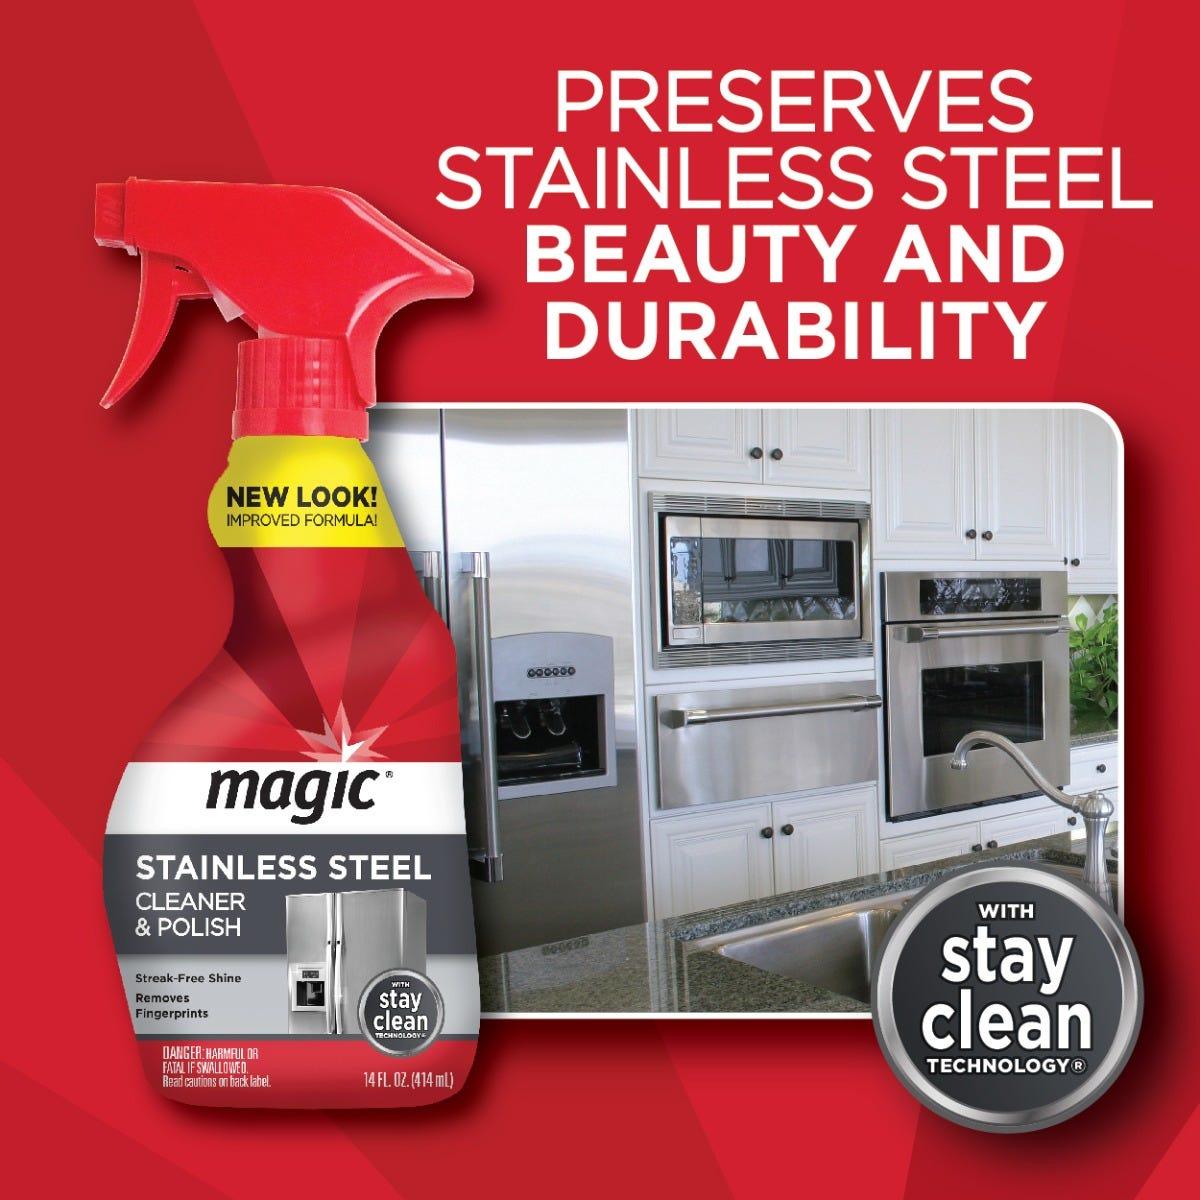 https://googone.com/media/catalog/product/m/a/magic_stainless_steel_cleaner_spray_beauty.jpg